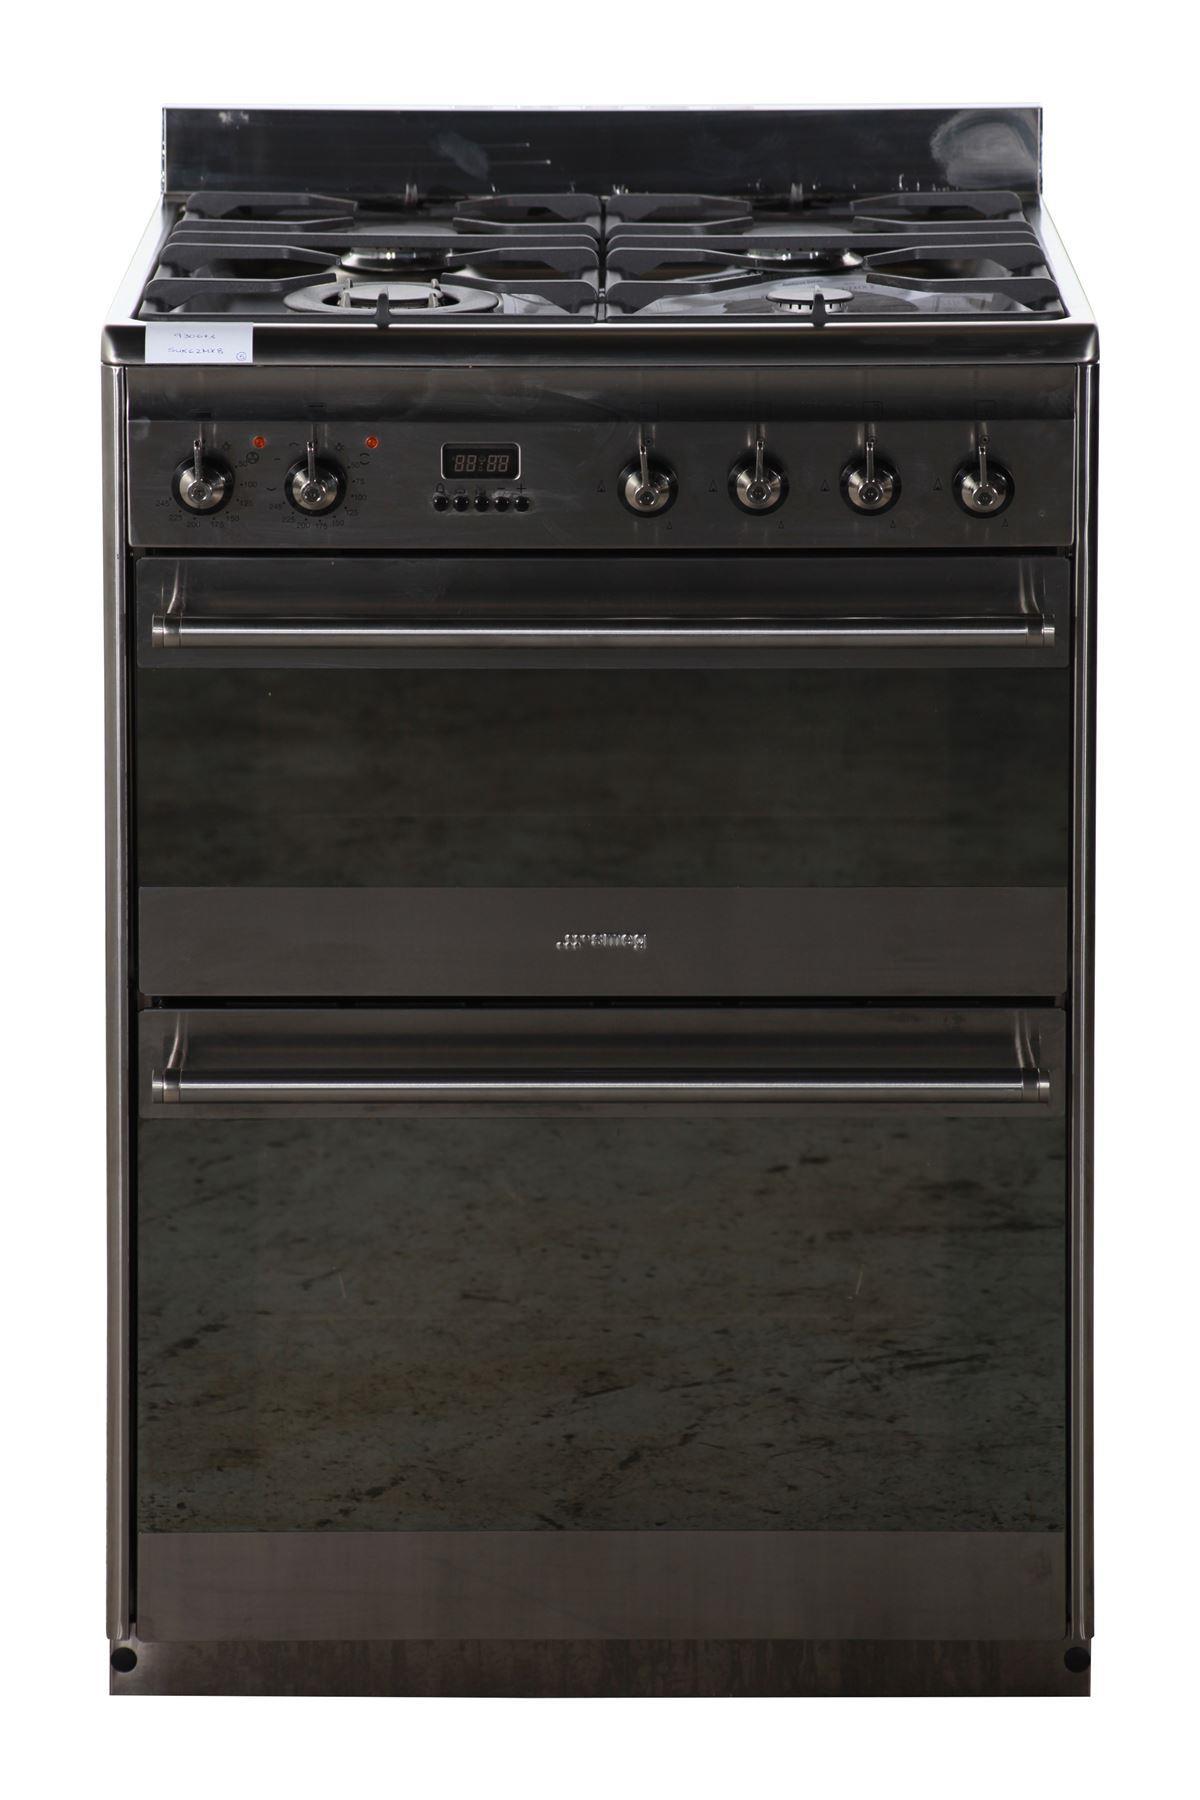 smeg dual fuel cooker suk62mx8 silver online store. Black Bedroom Furniture Sets. Home Design Ideas